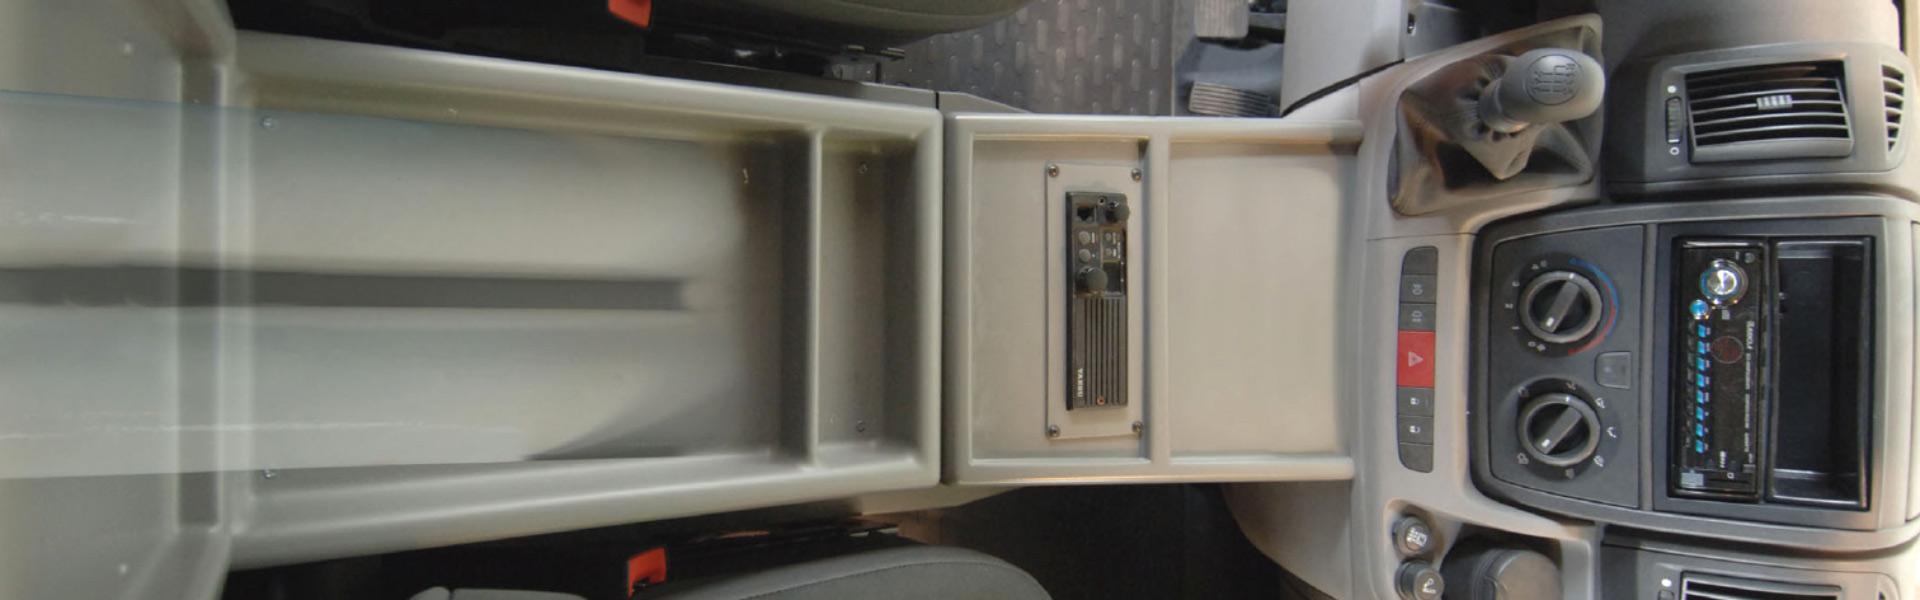 Oxygen tanks compartment